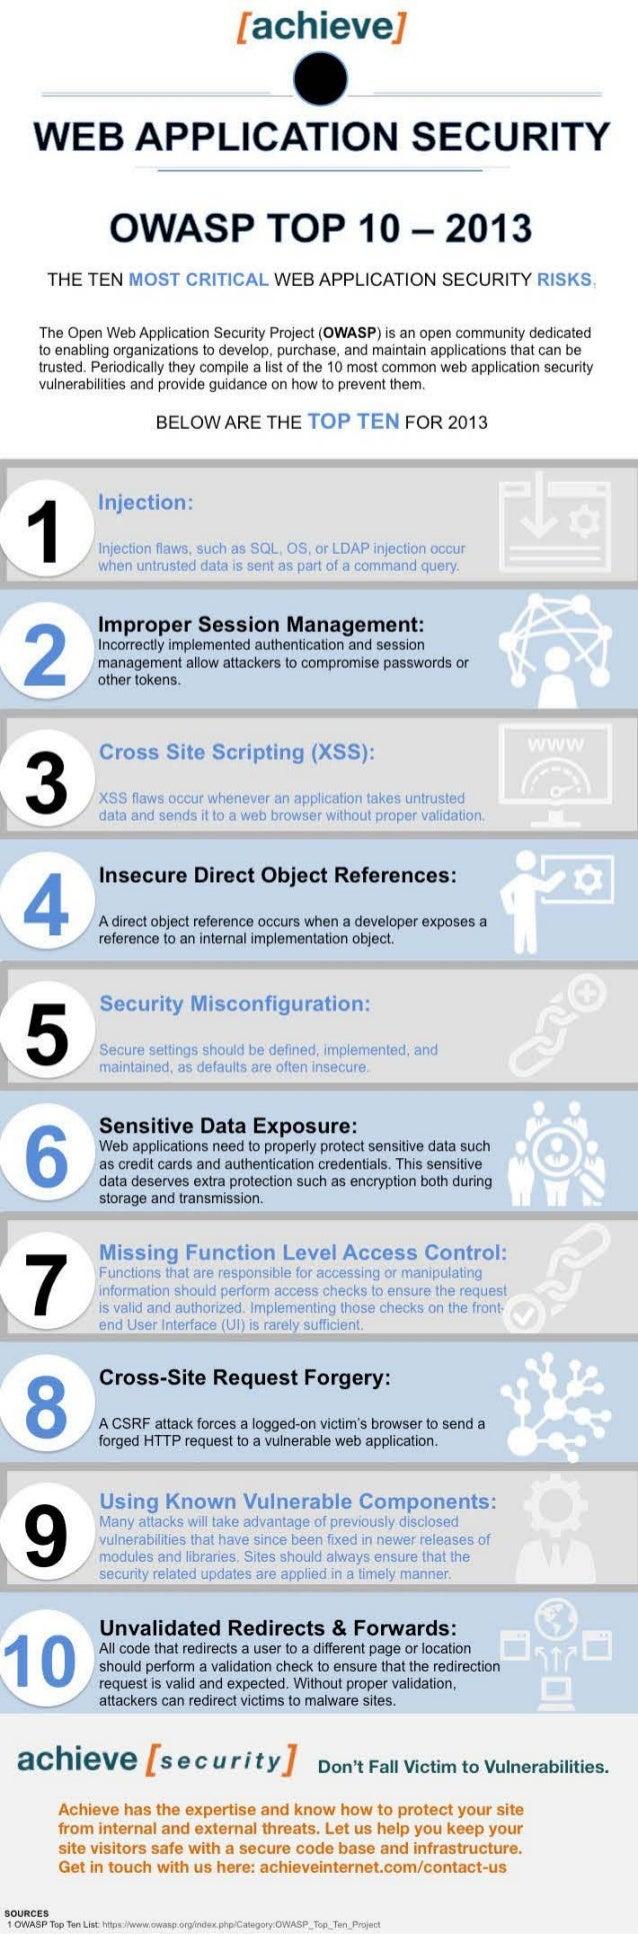 OWASP Web Application Infographic | Achieve Internet